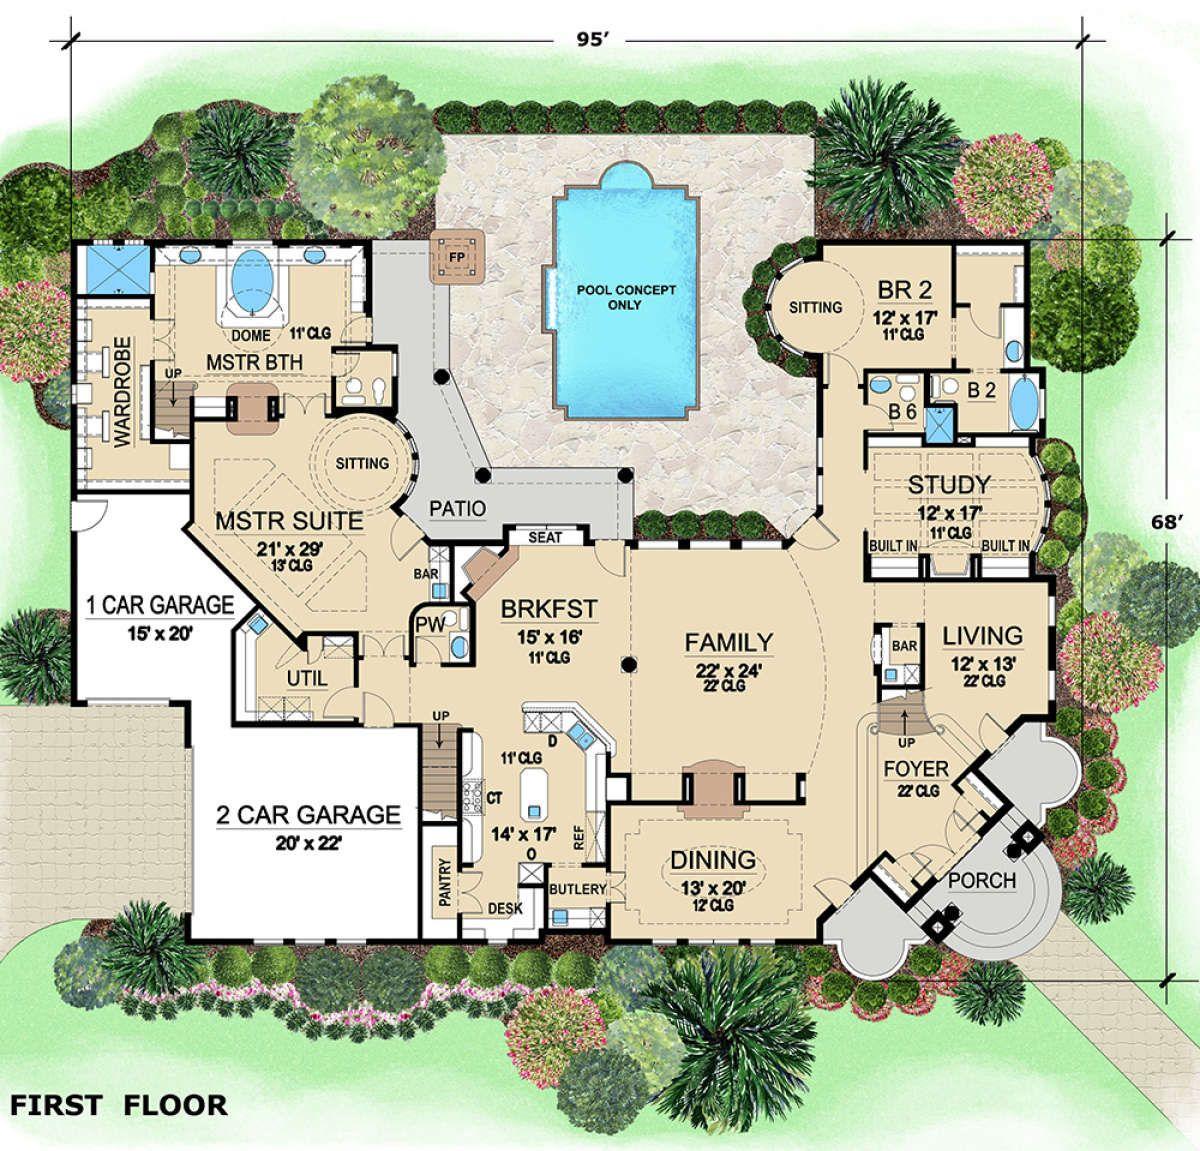 House Plan 5445-00295